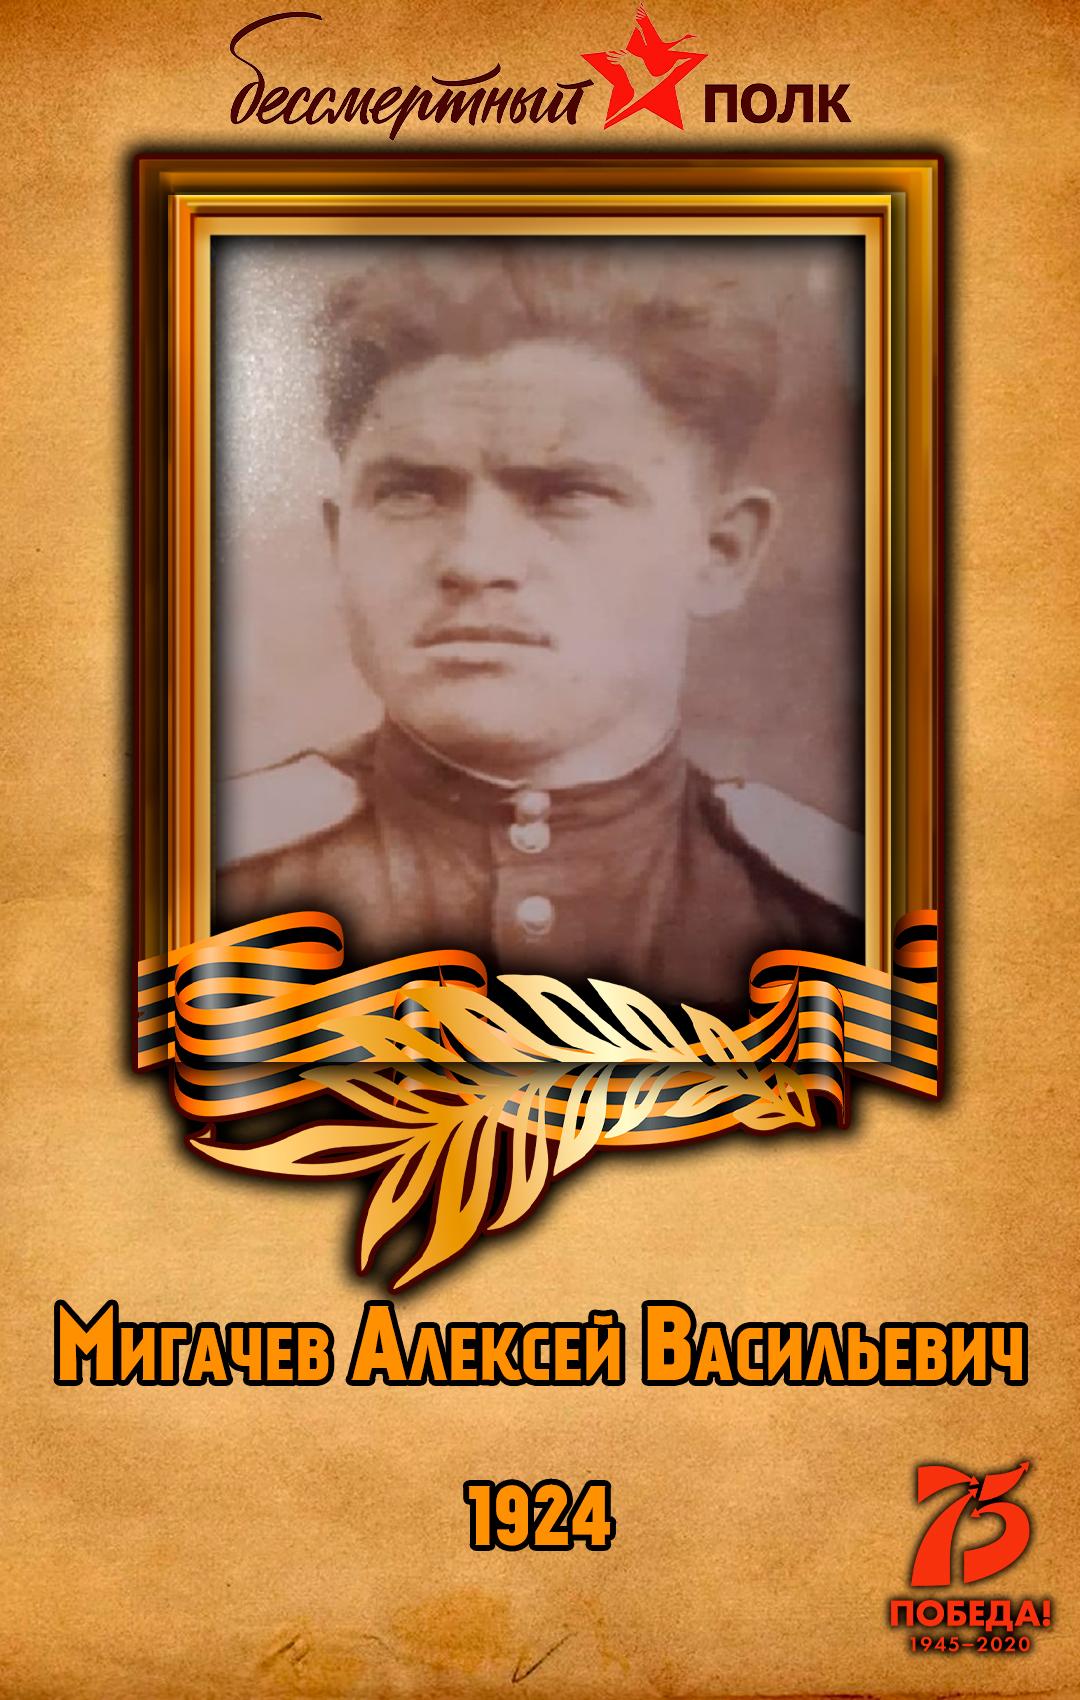 Мигачев-Алексей-Васильевич